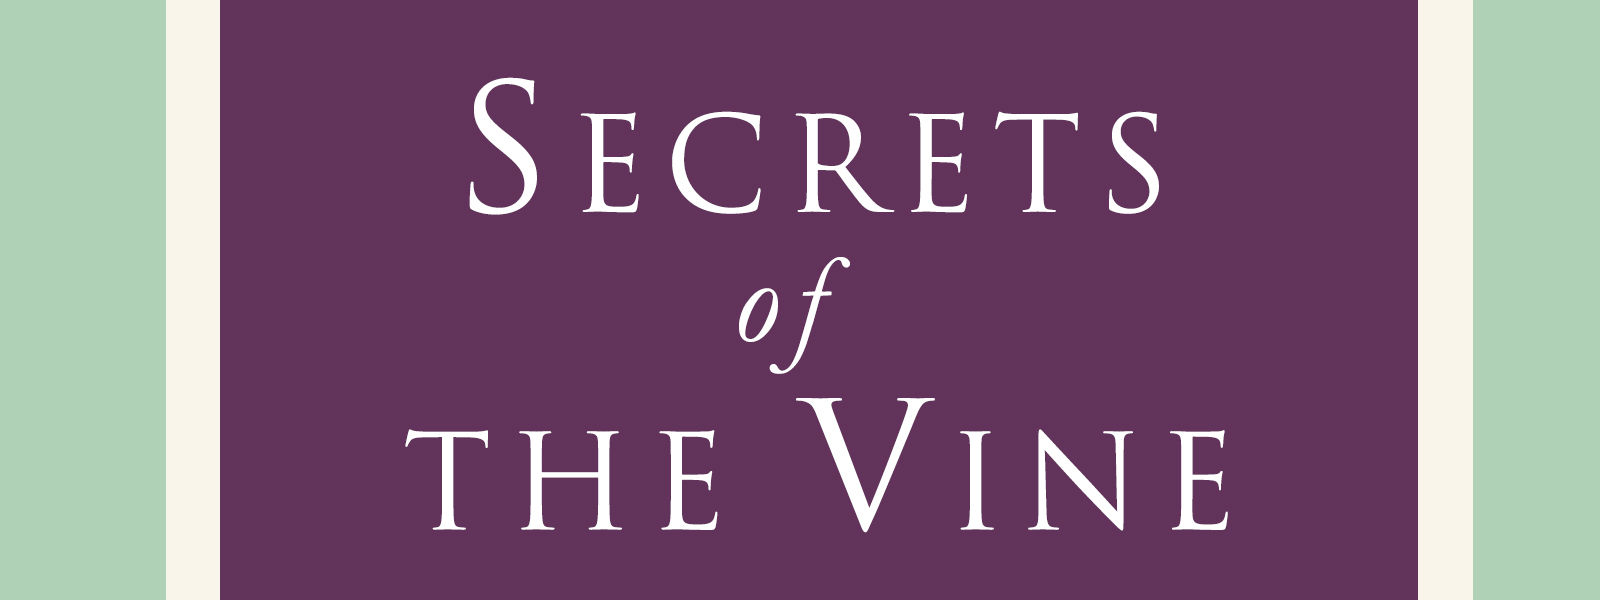 Rightnow Media Streaming Video Bible Study Secrets Of The Vine